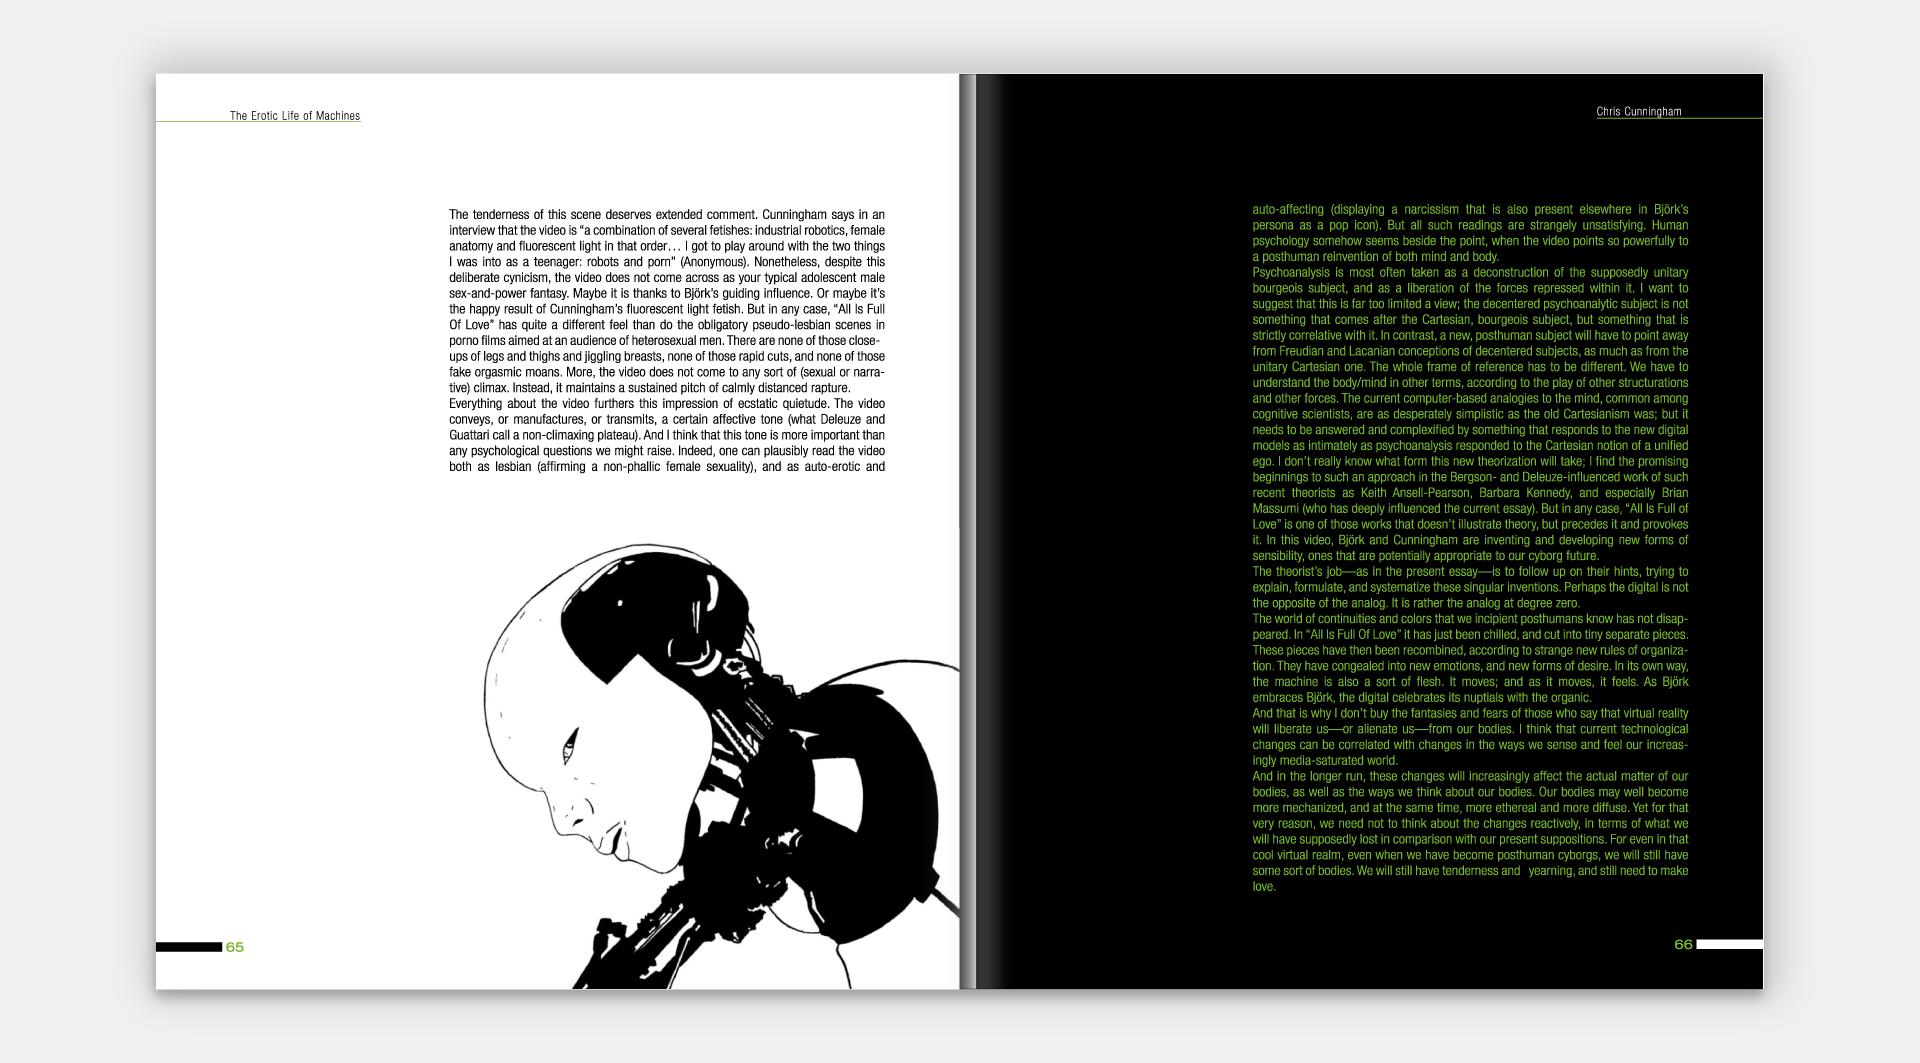 Seite 63-64